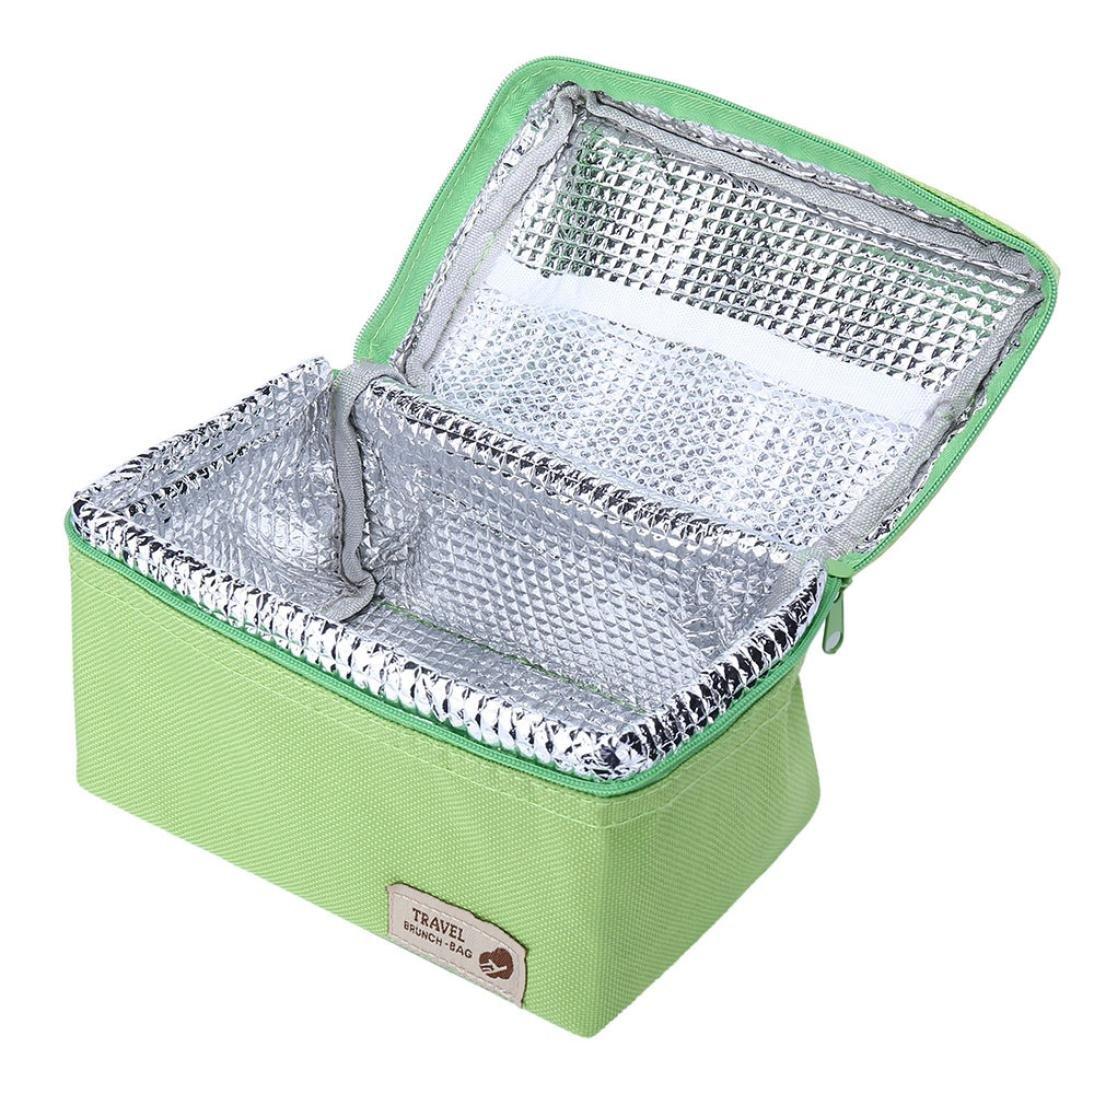 Compras exterior Auto Silver Bolsa t/érmica porta alimentos STRIR impermeable bolsa nevera cesta de la compra suave enfriador aislado Picnic para alimentos Negocios camping